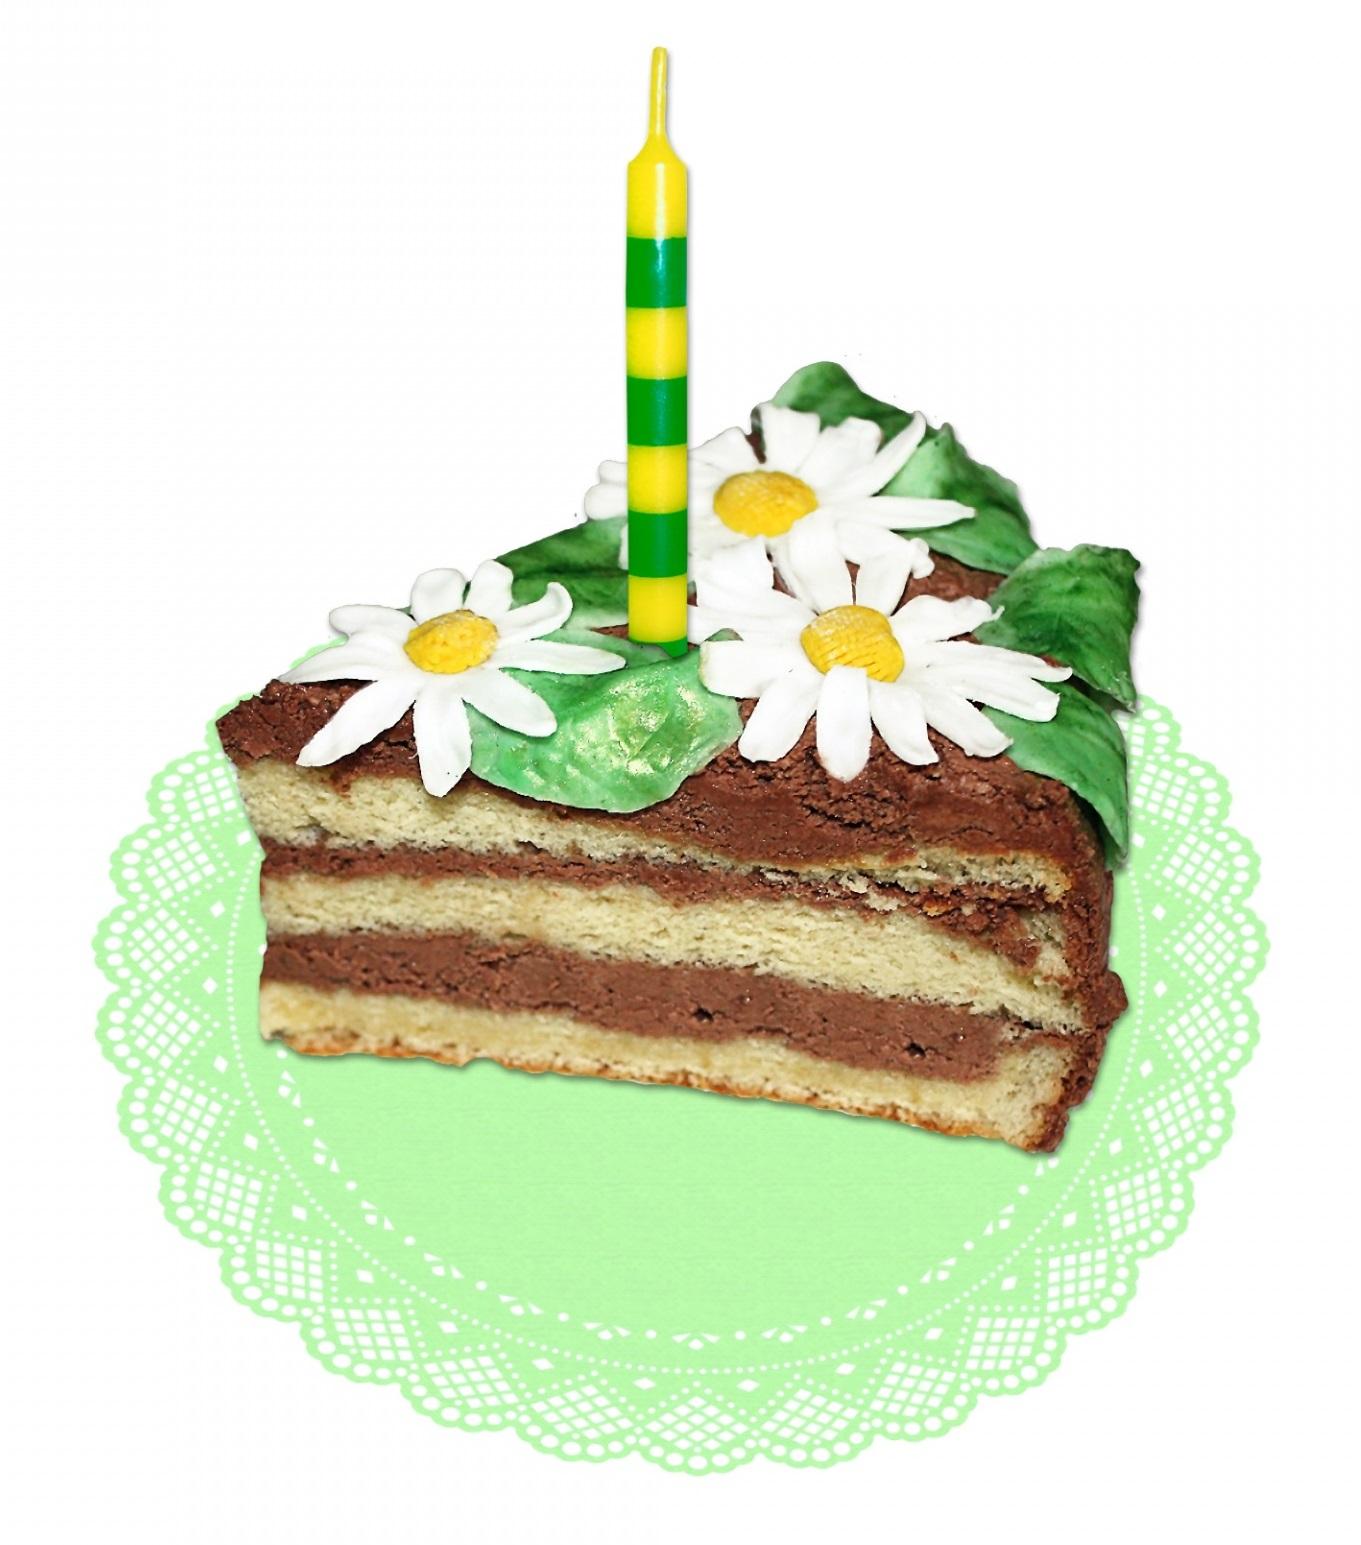 birthday-cake-1468253849k6d-2